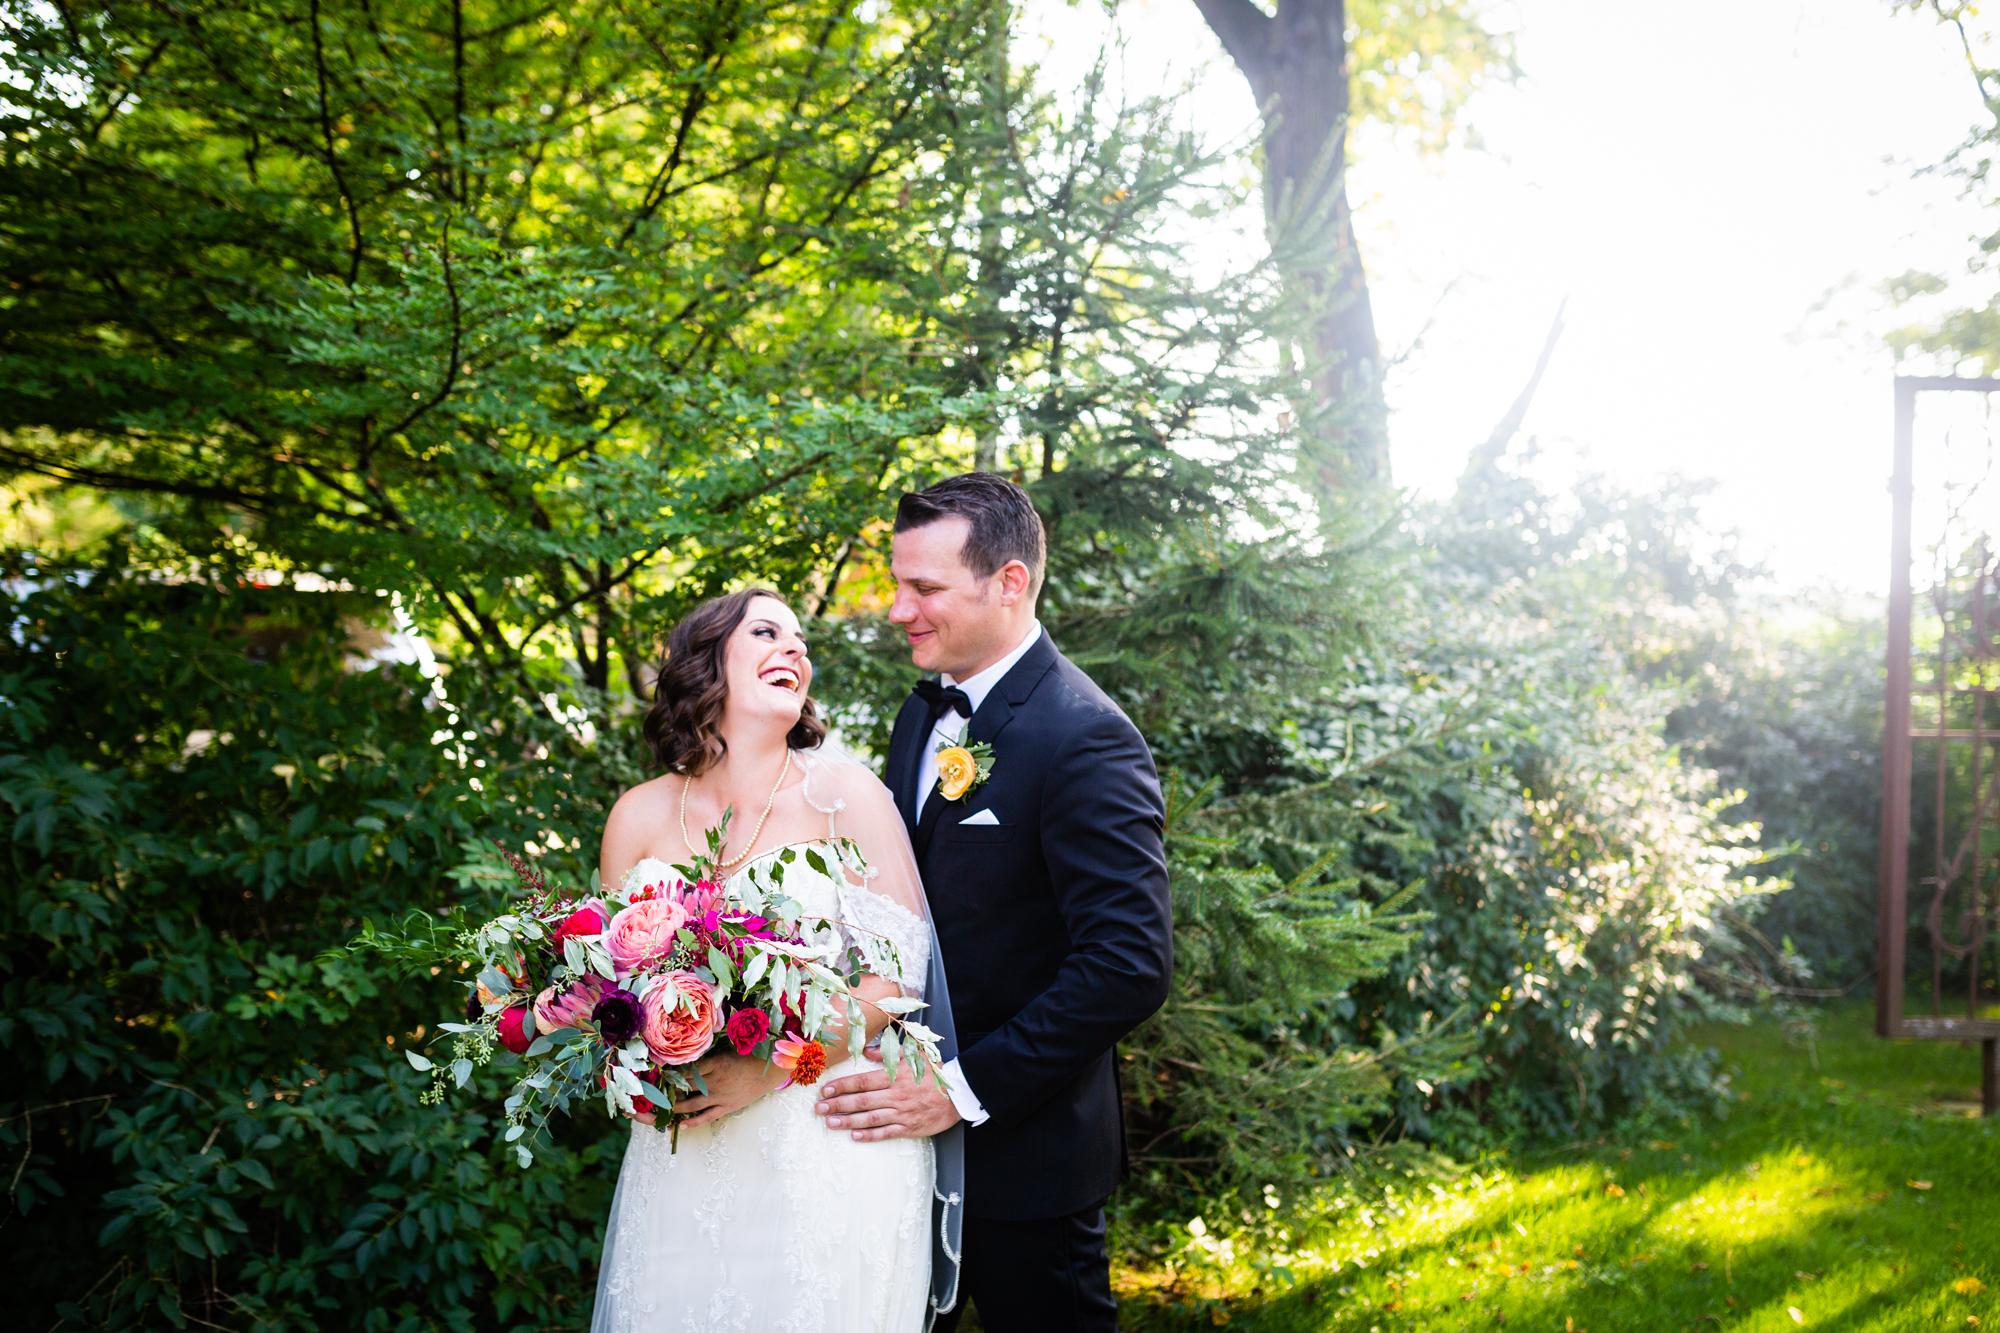 Hotel Du Village - LoveStruck Pictures - Wedding Photography-043.jpg